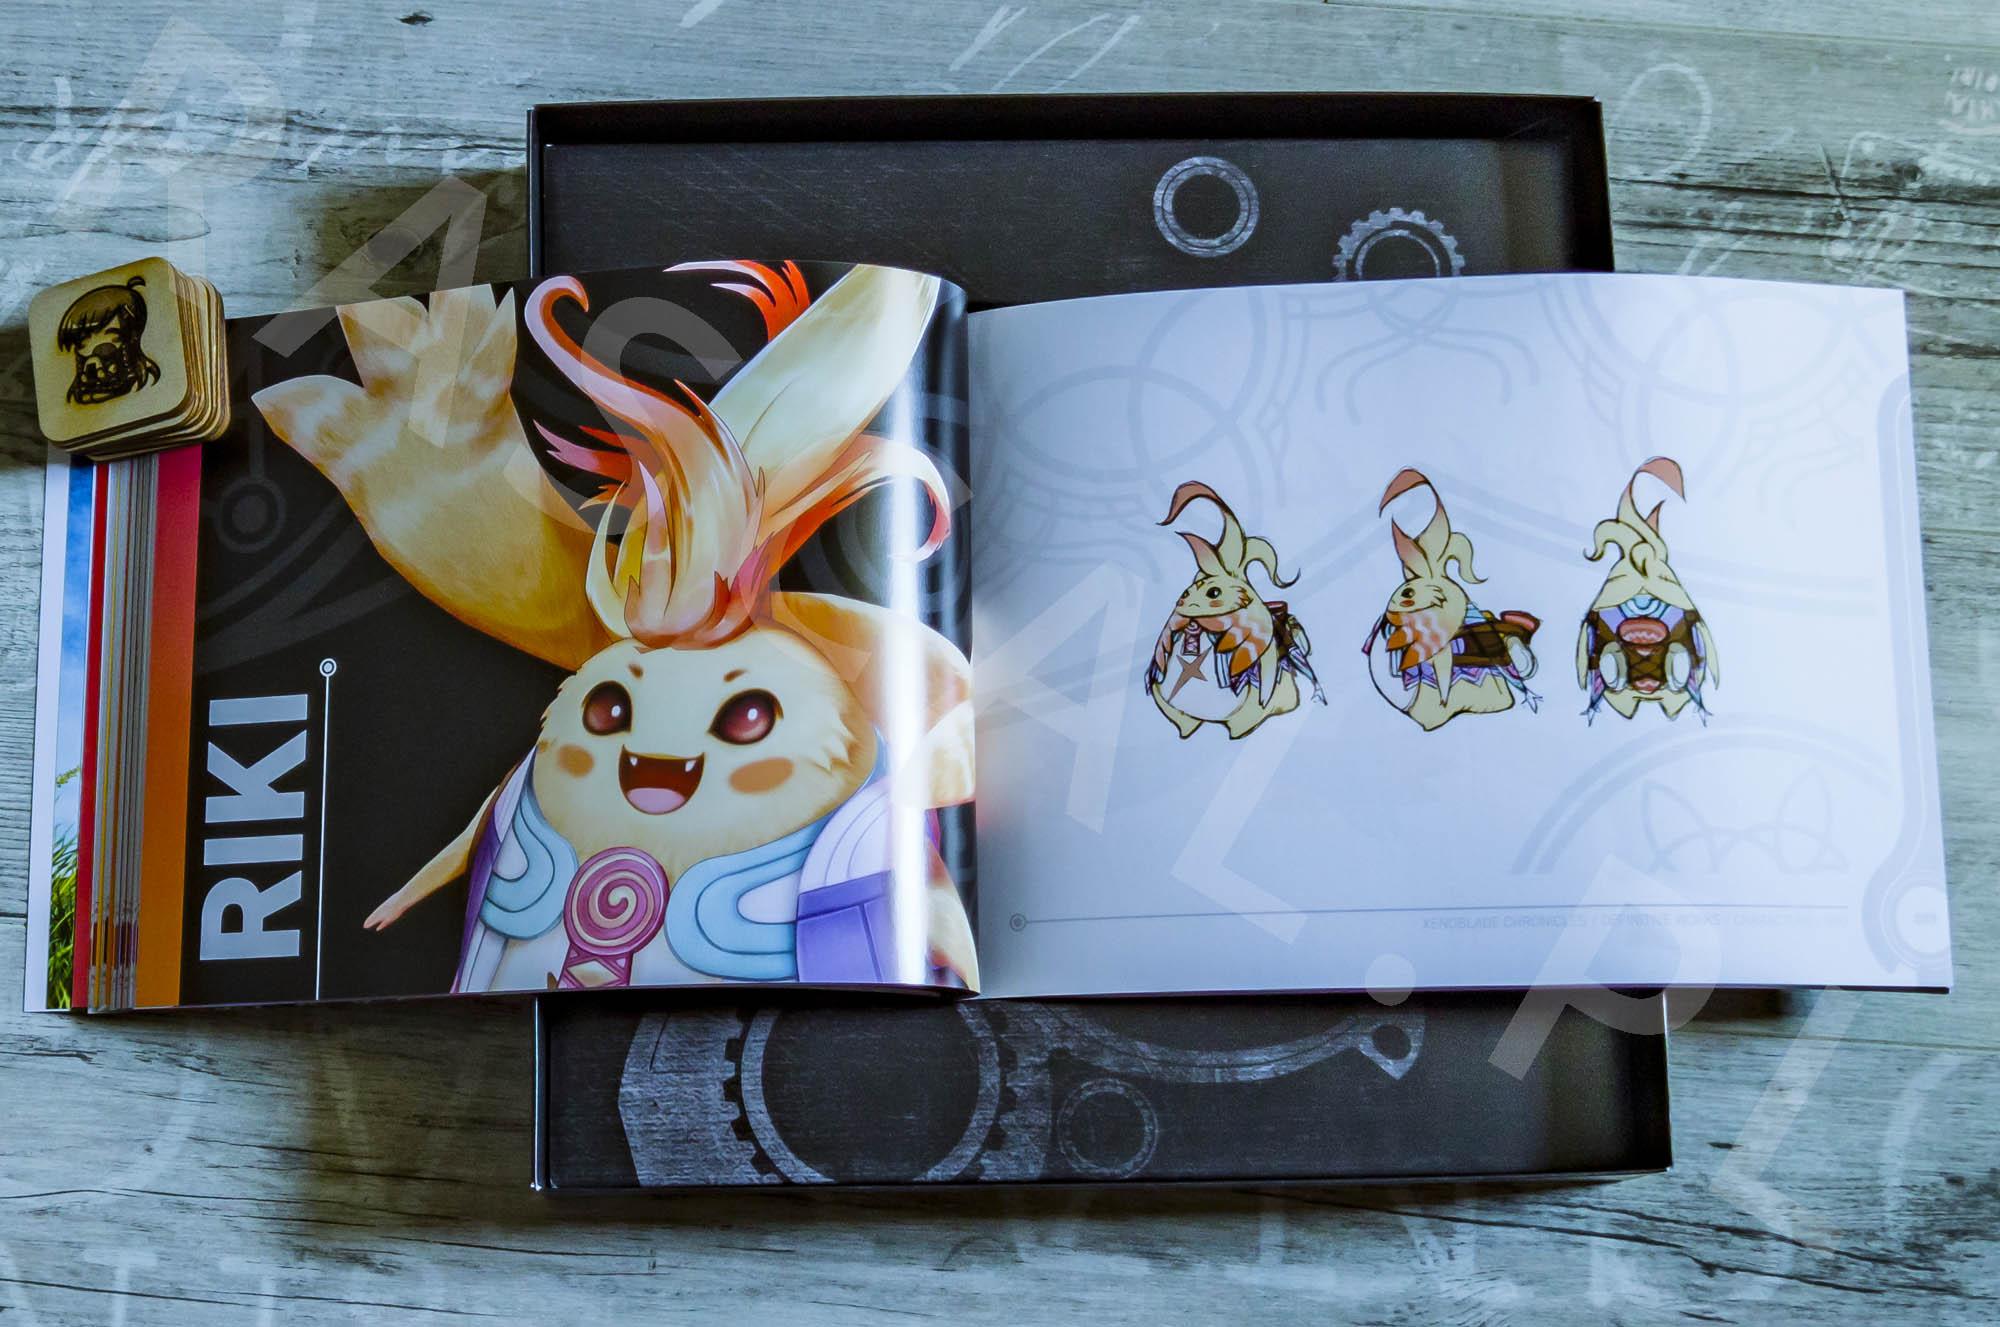 Xenoblade Chronicles Definitive Edition Collectors Set - Artbook - 10 - Riki